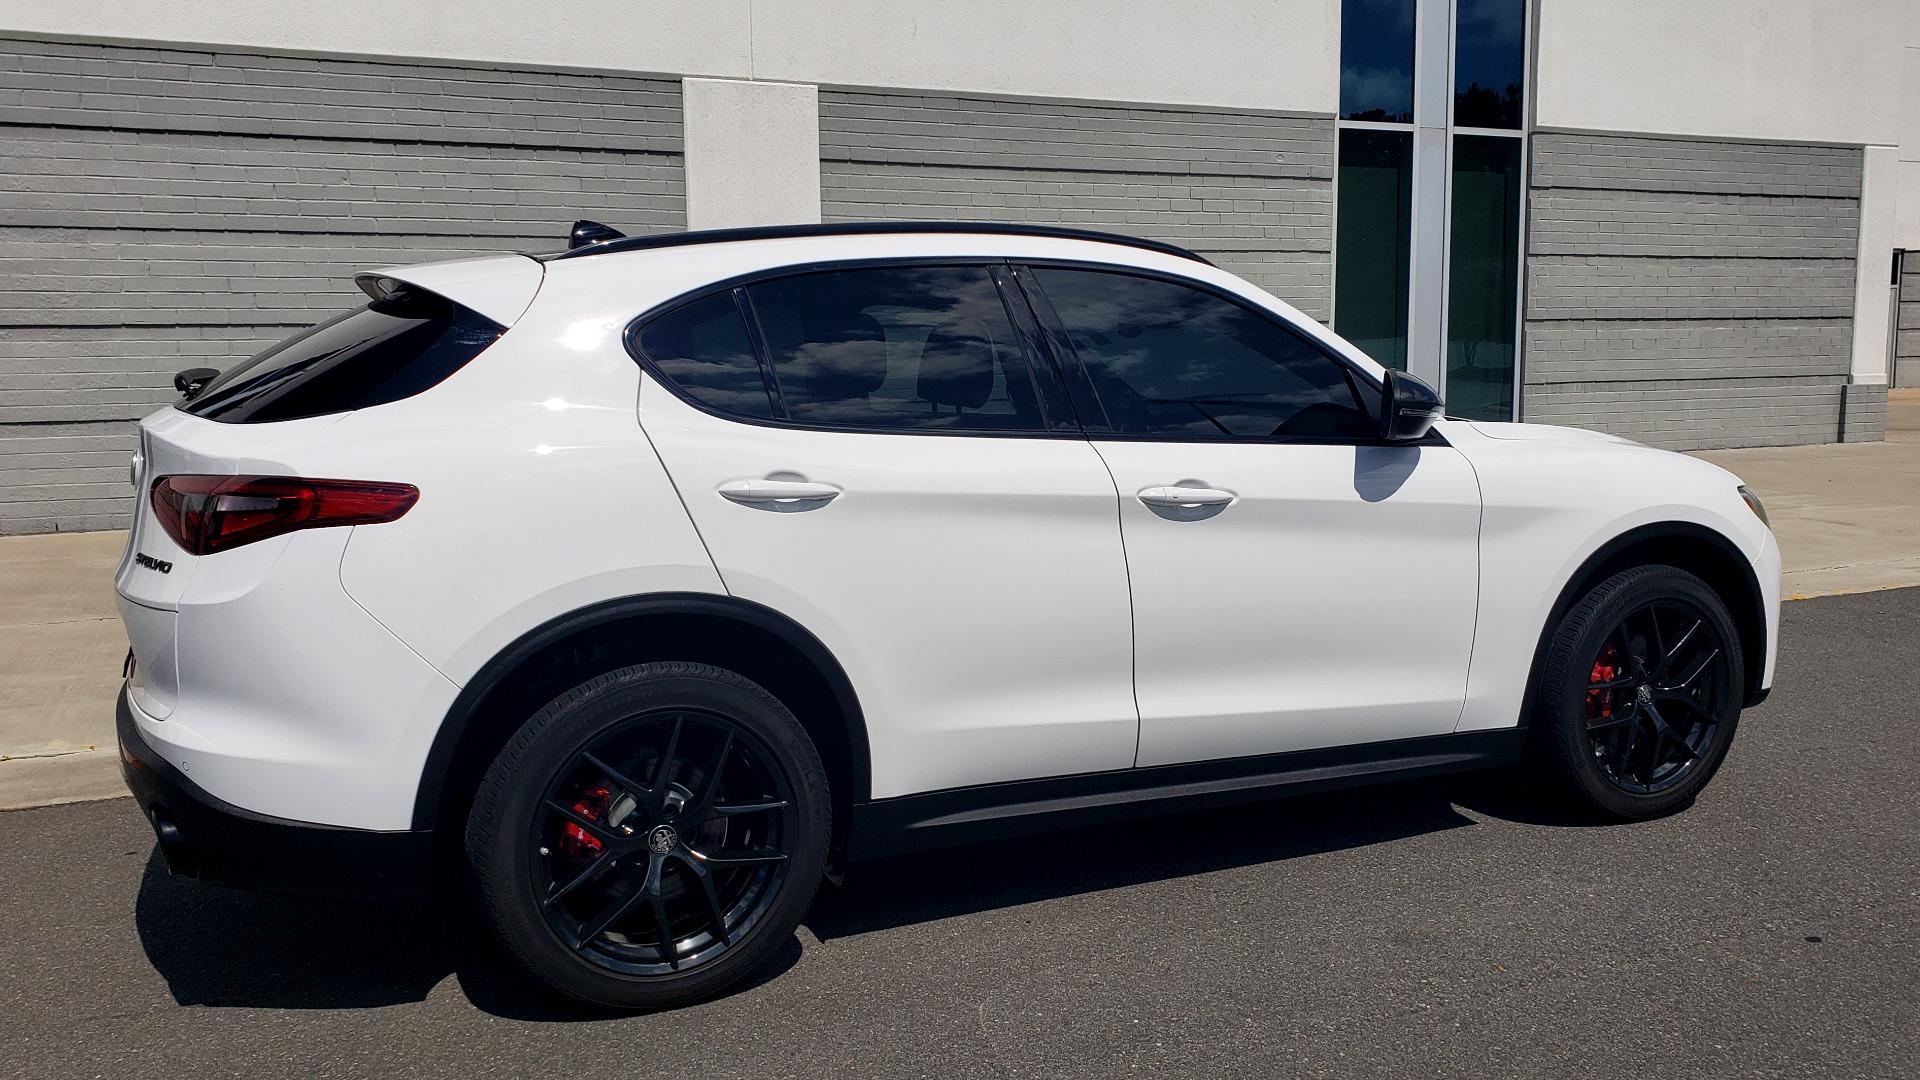 Used 2019 Alfa Romeo STELVIO TI SPORT AWD / 2.0L TURBO / 8-SPD AUTO / DRVR ASST / REARVIEW for sale $37,495 at Formula Imports in Charlotte NC 28227 4